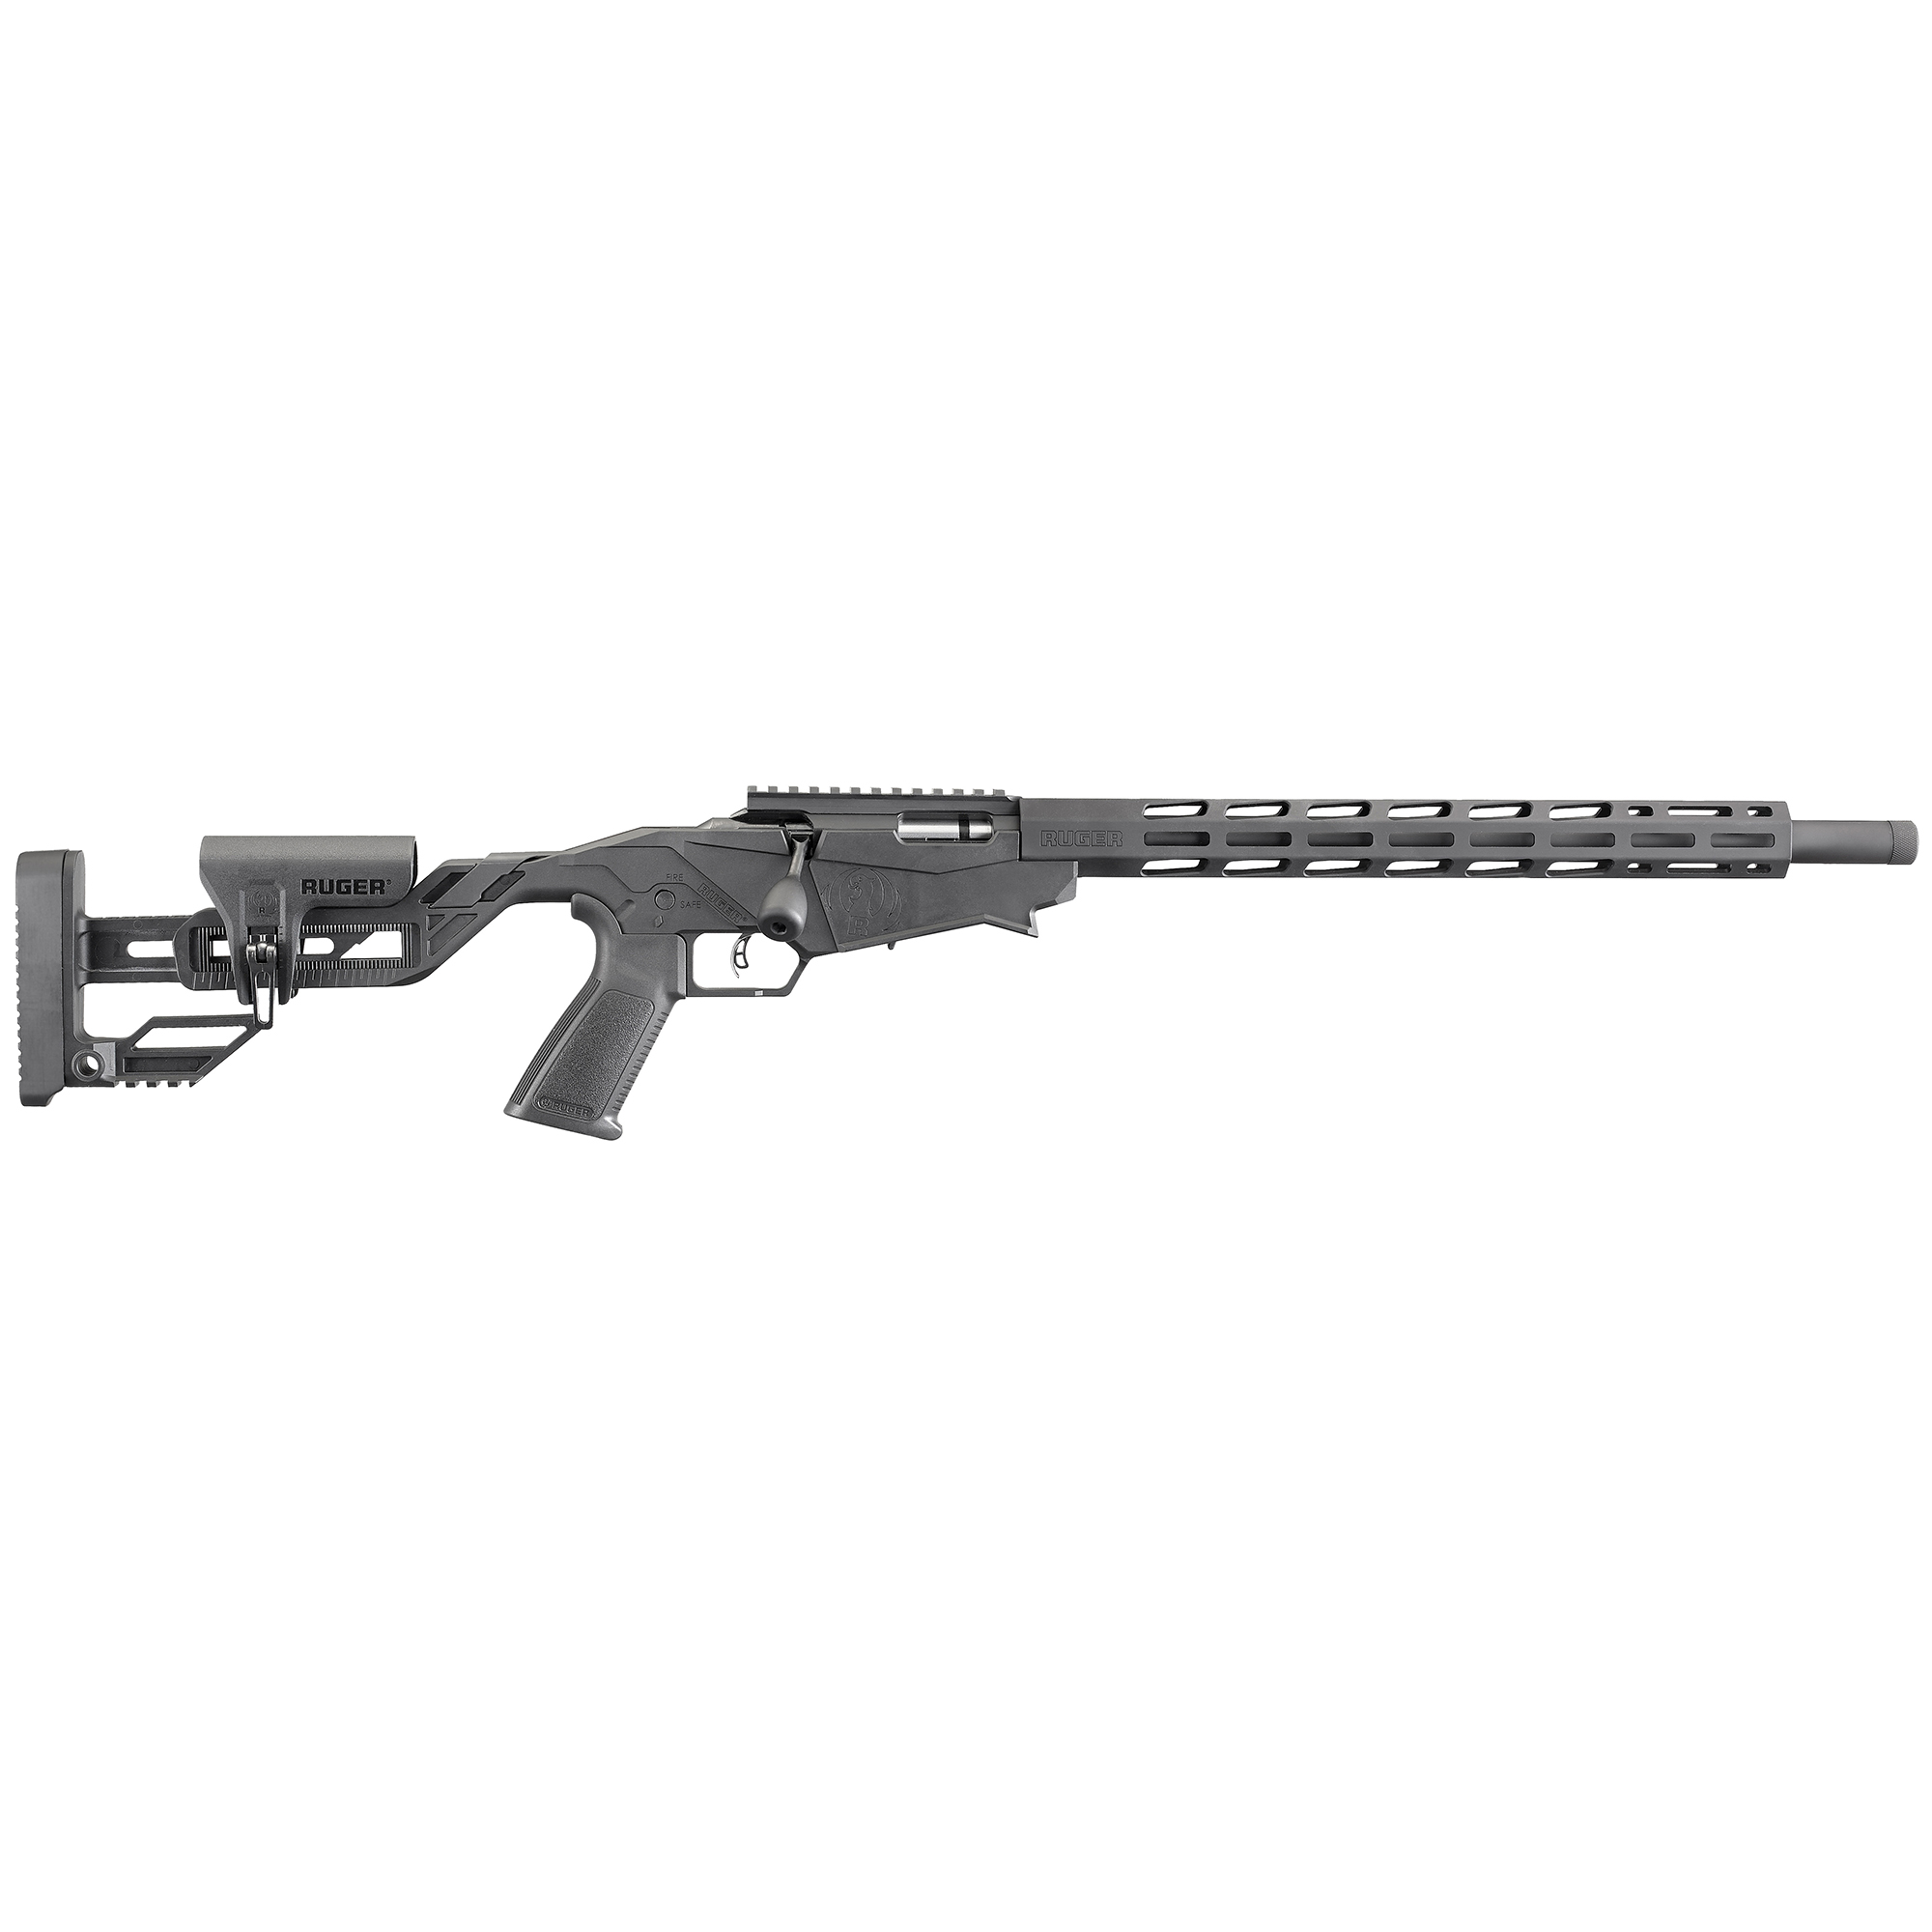 Ruger Precision Rimfire Rifle, 10 Rd.